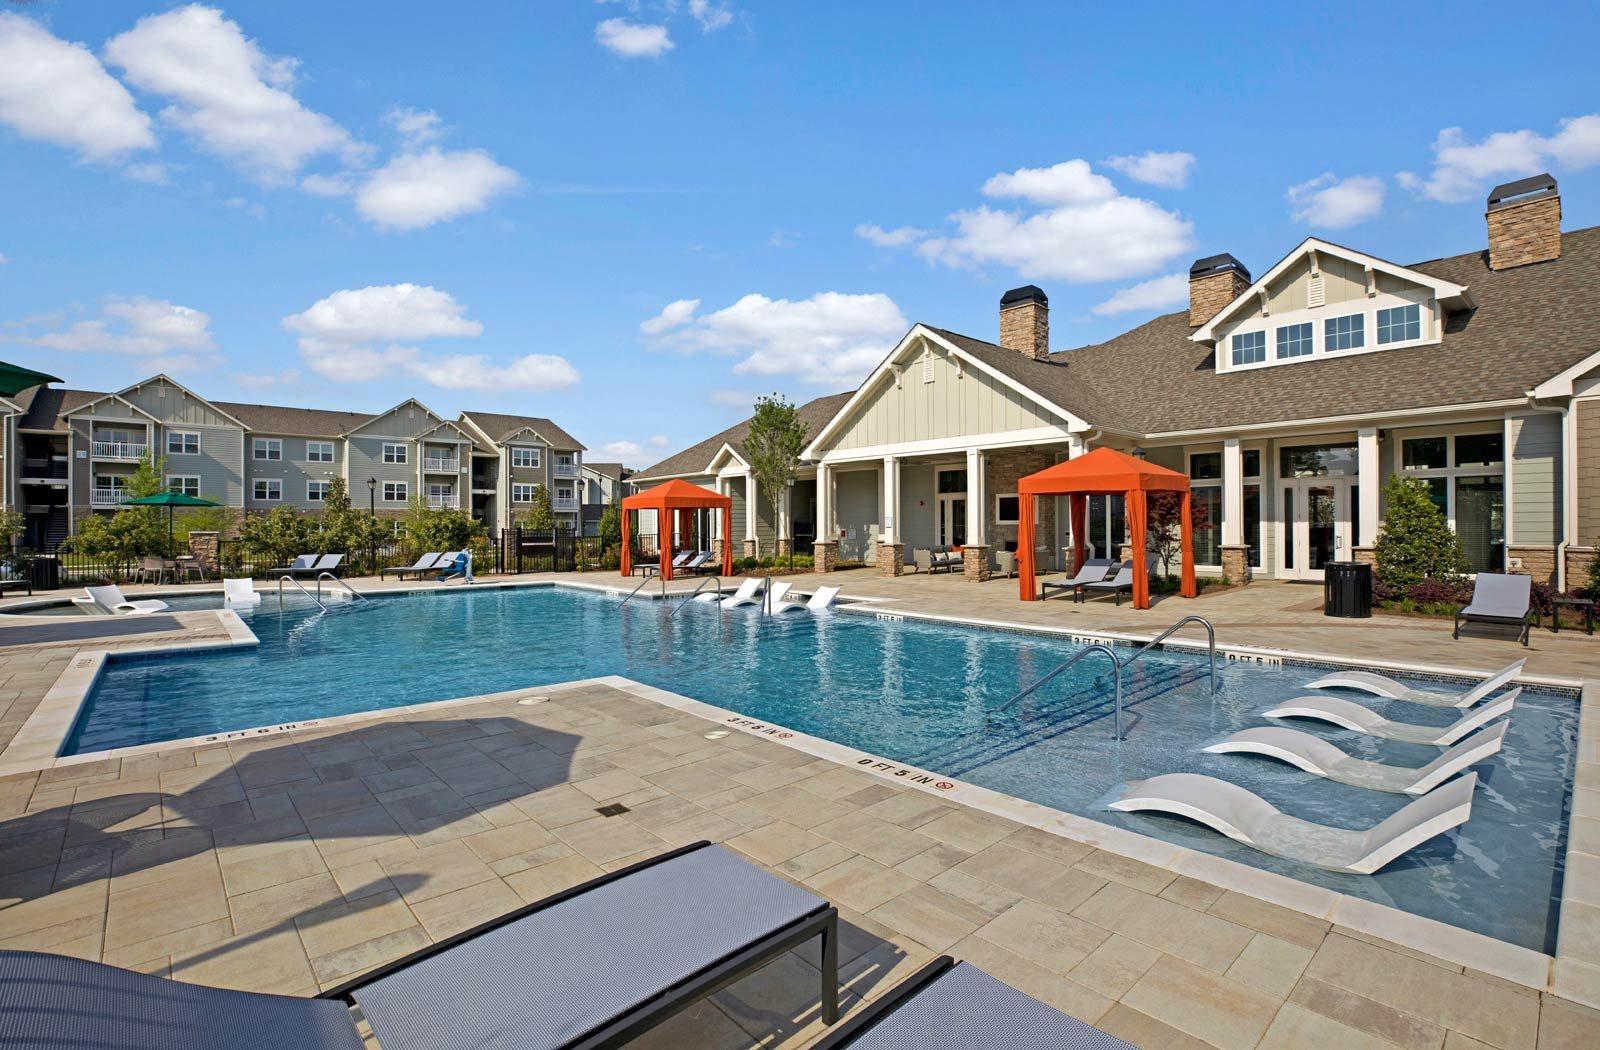 Swimming pool area view at Ascent at Mallard Creek Apartment Homes, Charlotte